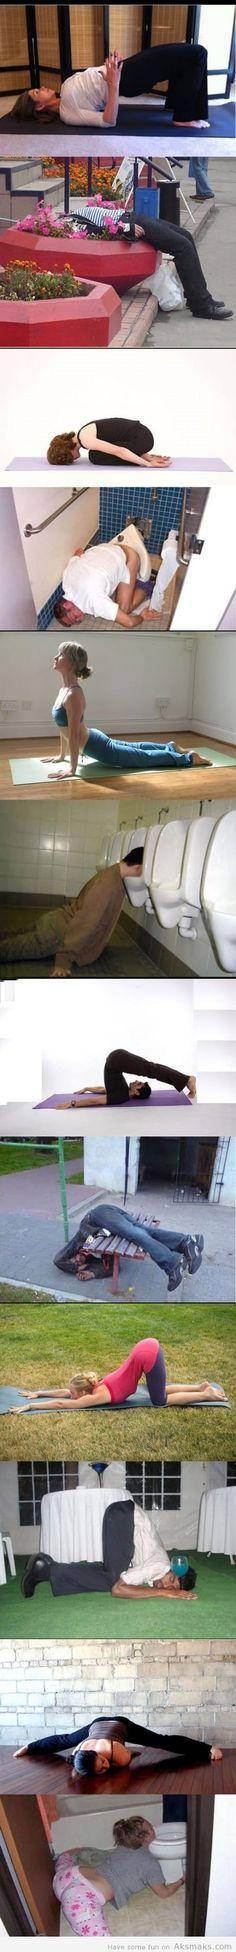 Yoga vs Booze lol!